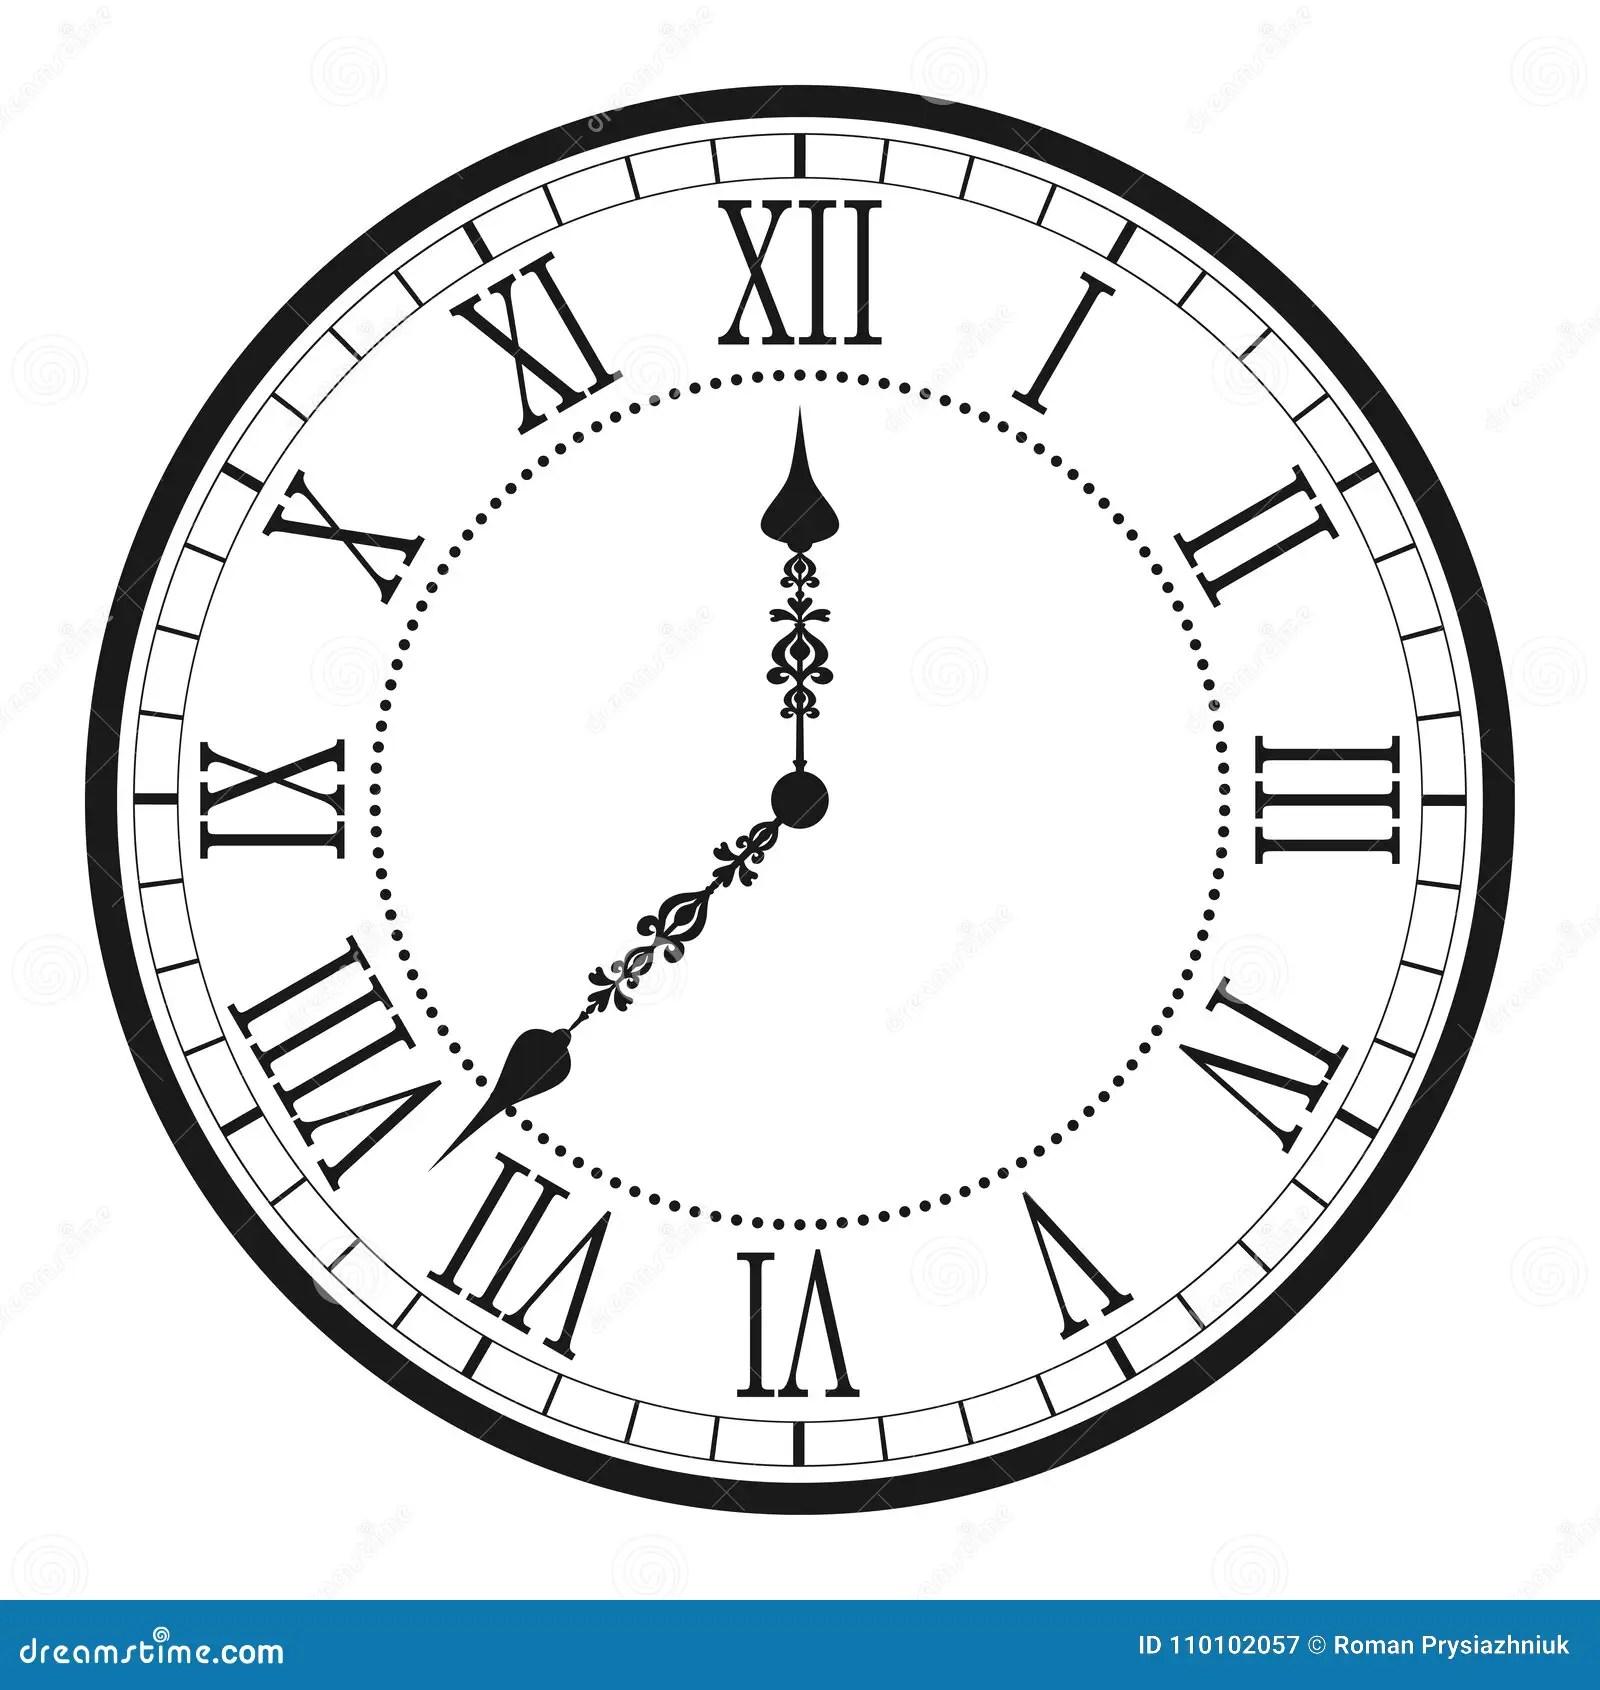 Vintage Clock With Roman Numeral Antique Wall Clock Face Dial Vector Stock Vector